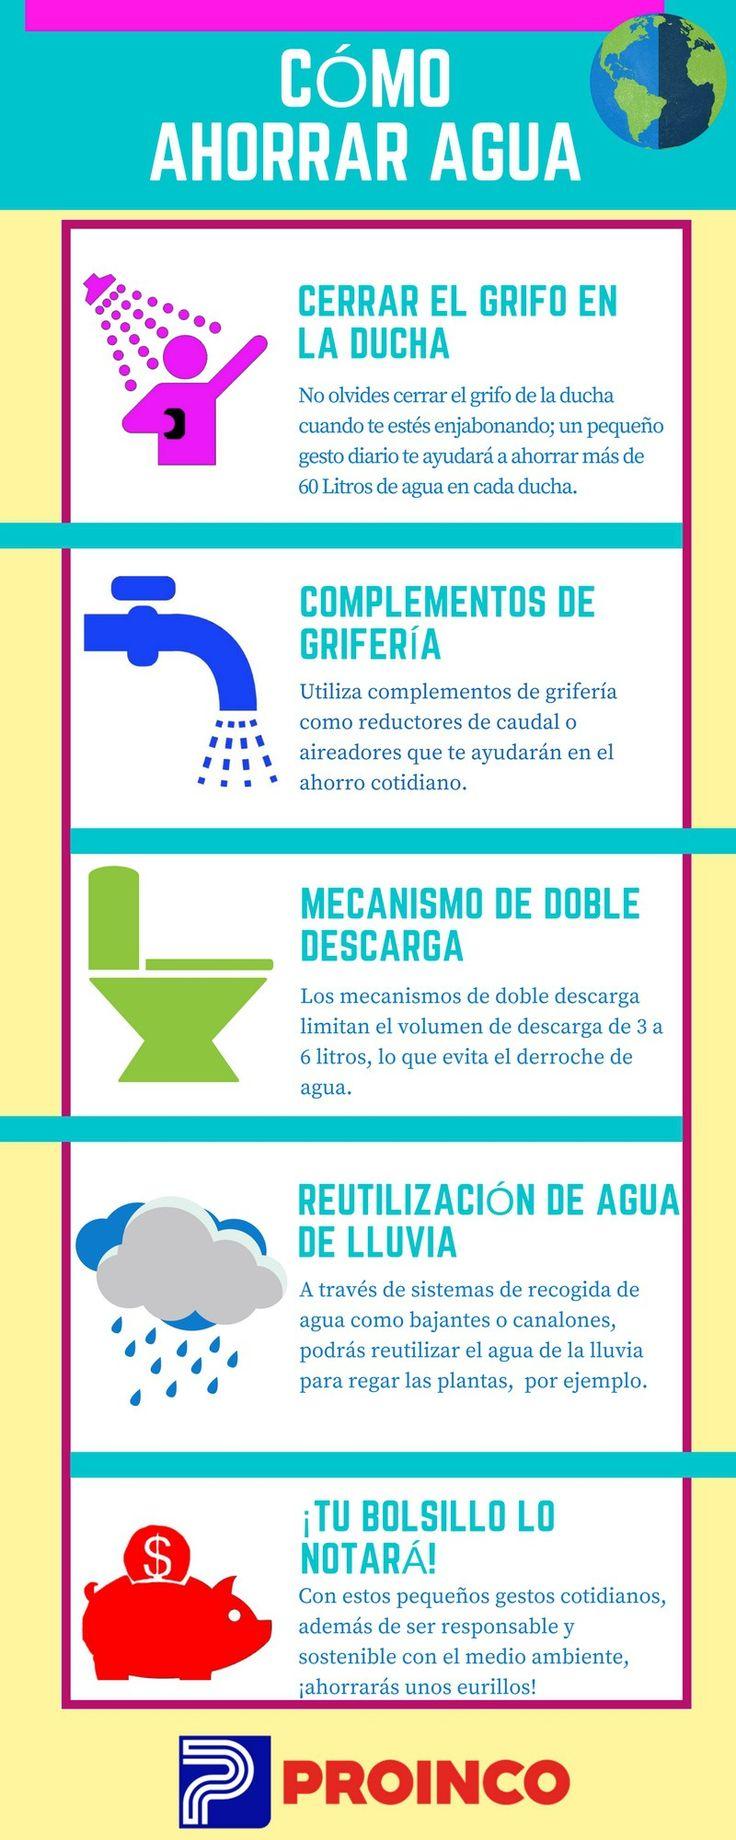 M s de 25 ideas incre bles sobre ahorrar agua en pinterest for Ideas para ahorrar agua